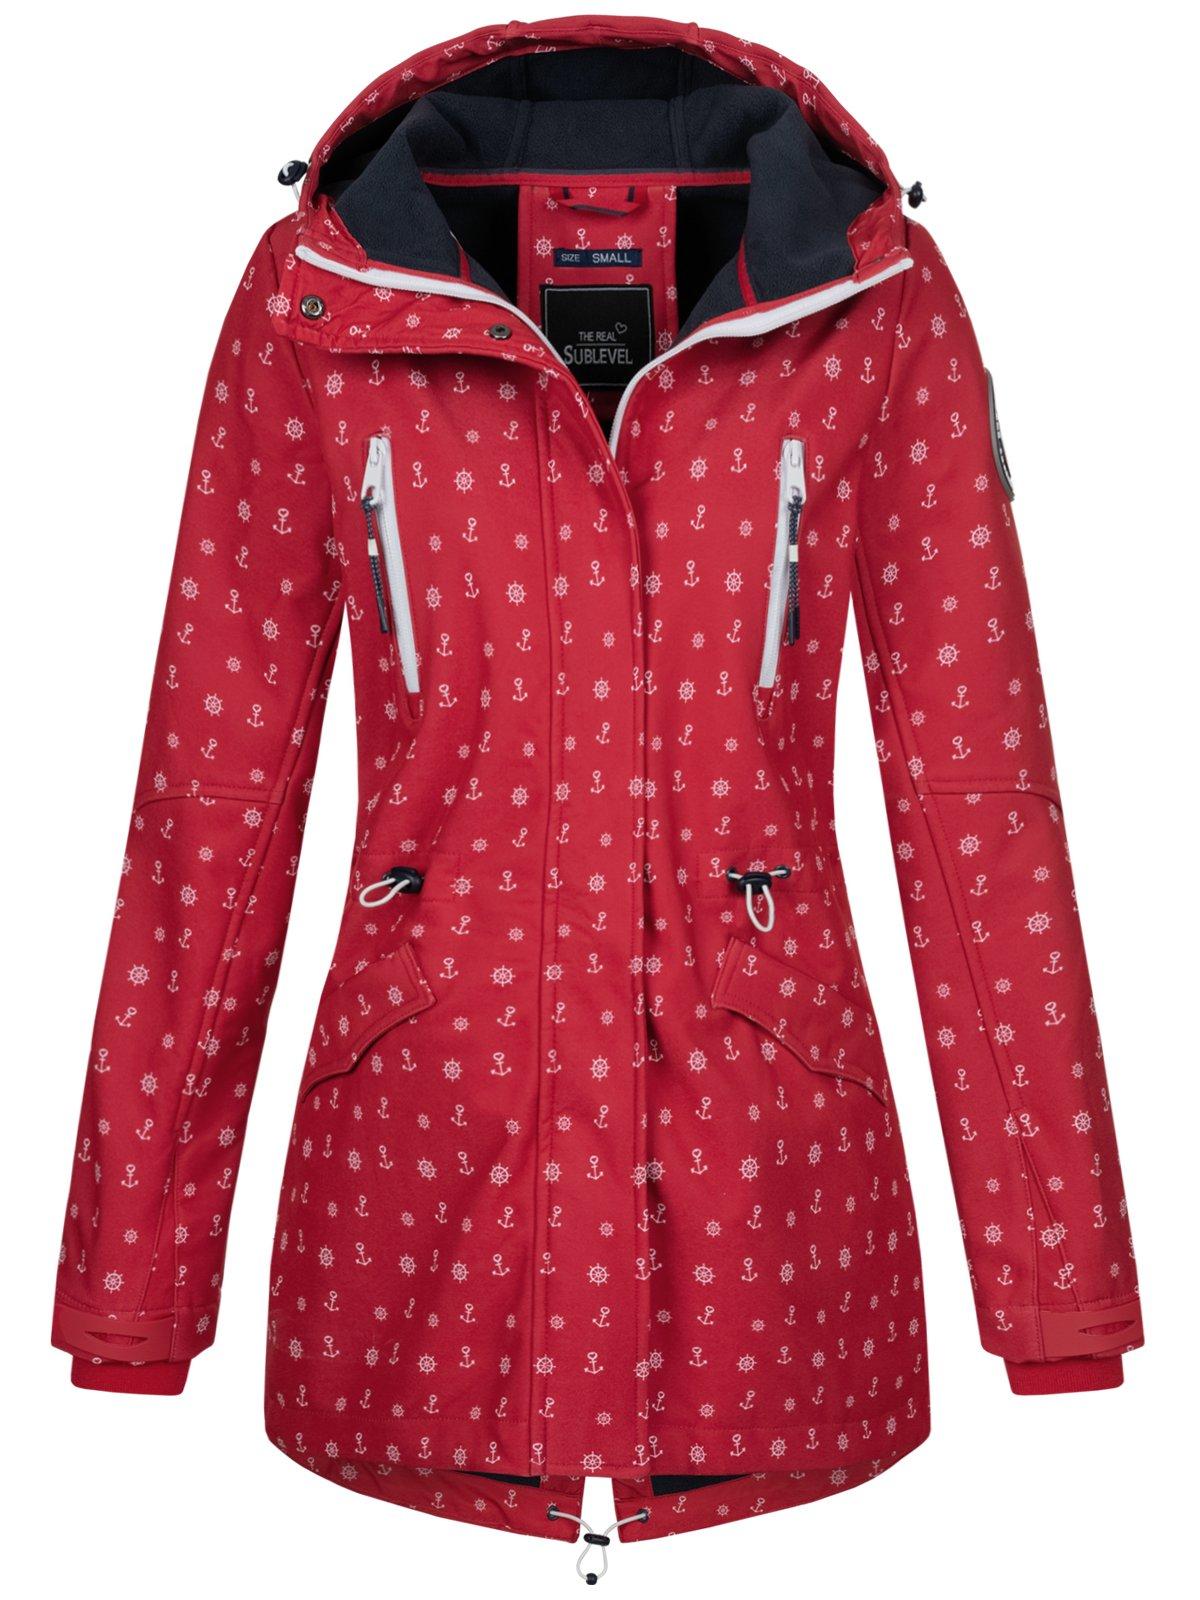 Details zu Sublevel Damen Jacke Softshelljacke Mantel Outdoor Damenjacke Anker LSL 367